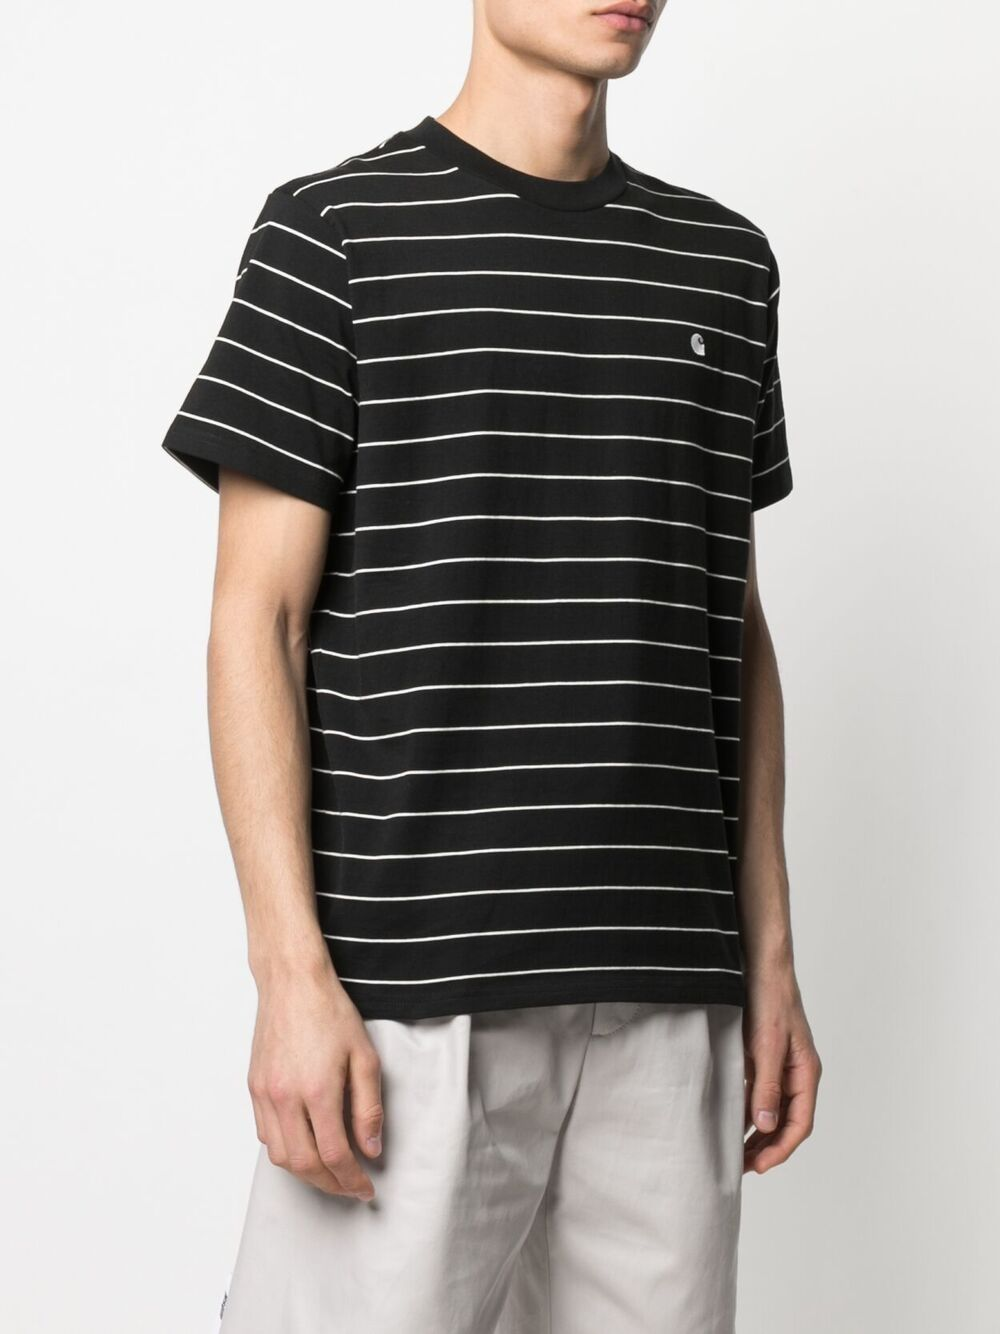 DENTON T-SHIRT CARHARTT WIP | T-shirts | I028925.0389.90